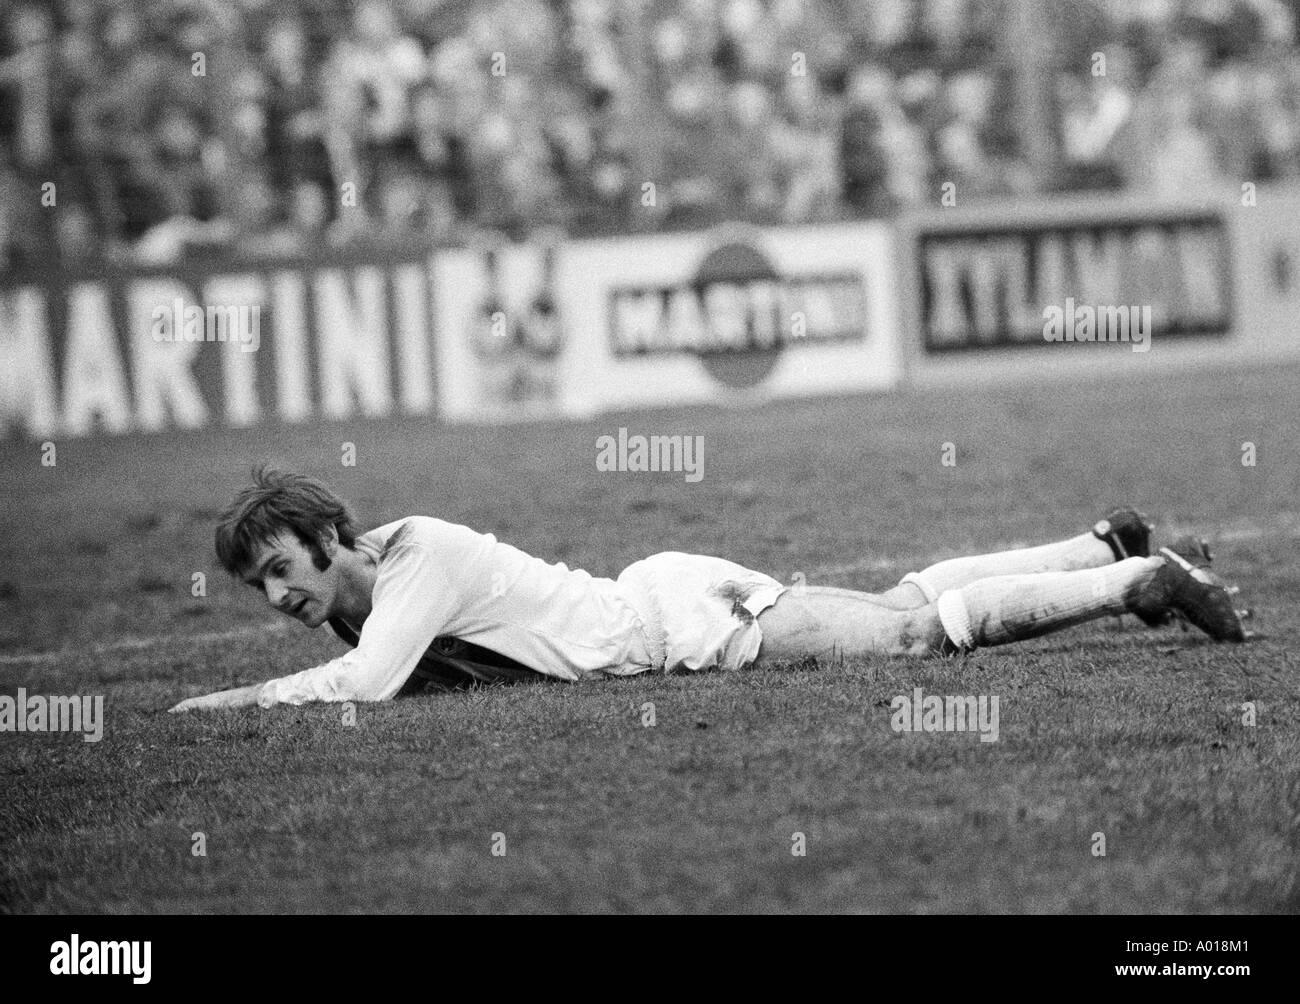 football, Bundesliga, 1973/1974, Borussia Moenchengladbach versus MSV Duisburg 3:2, Boekelberg Stadium, Horst Koeppel lying on the lawn, b&w, black and white, black & white photography - Stock Image